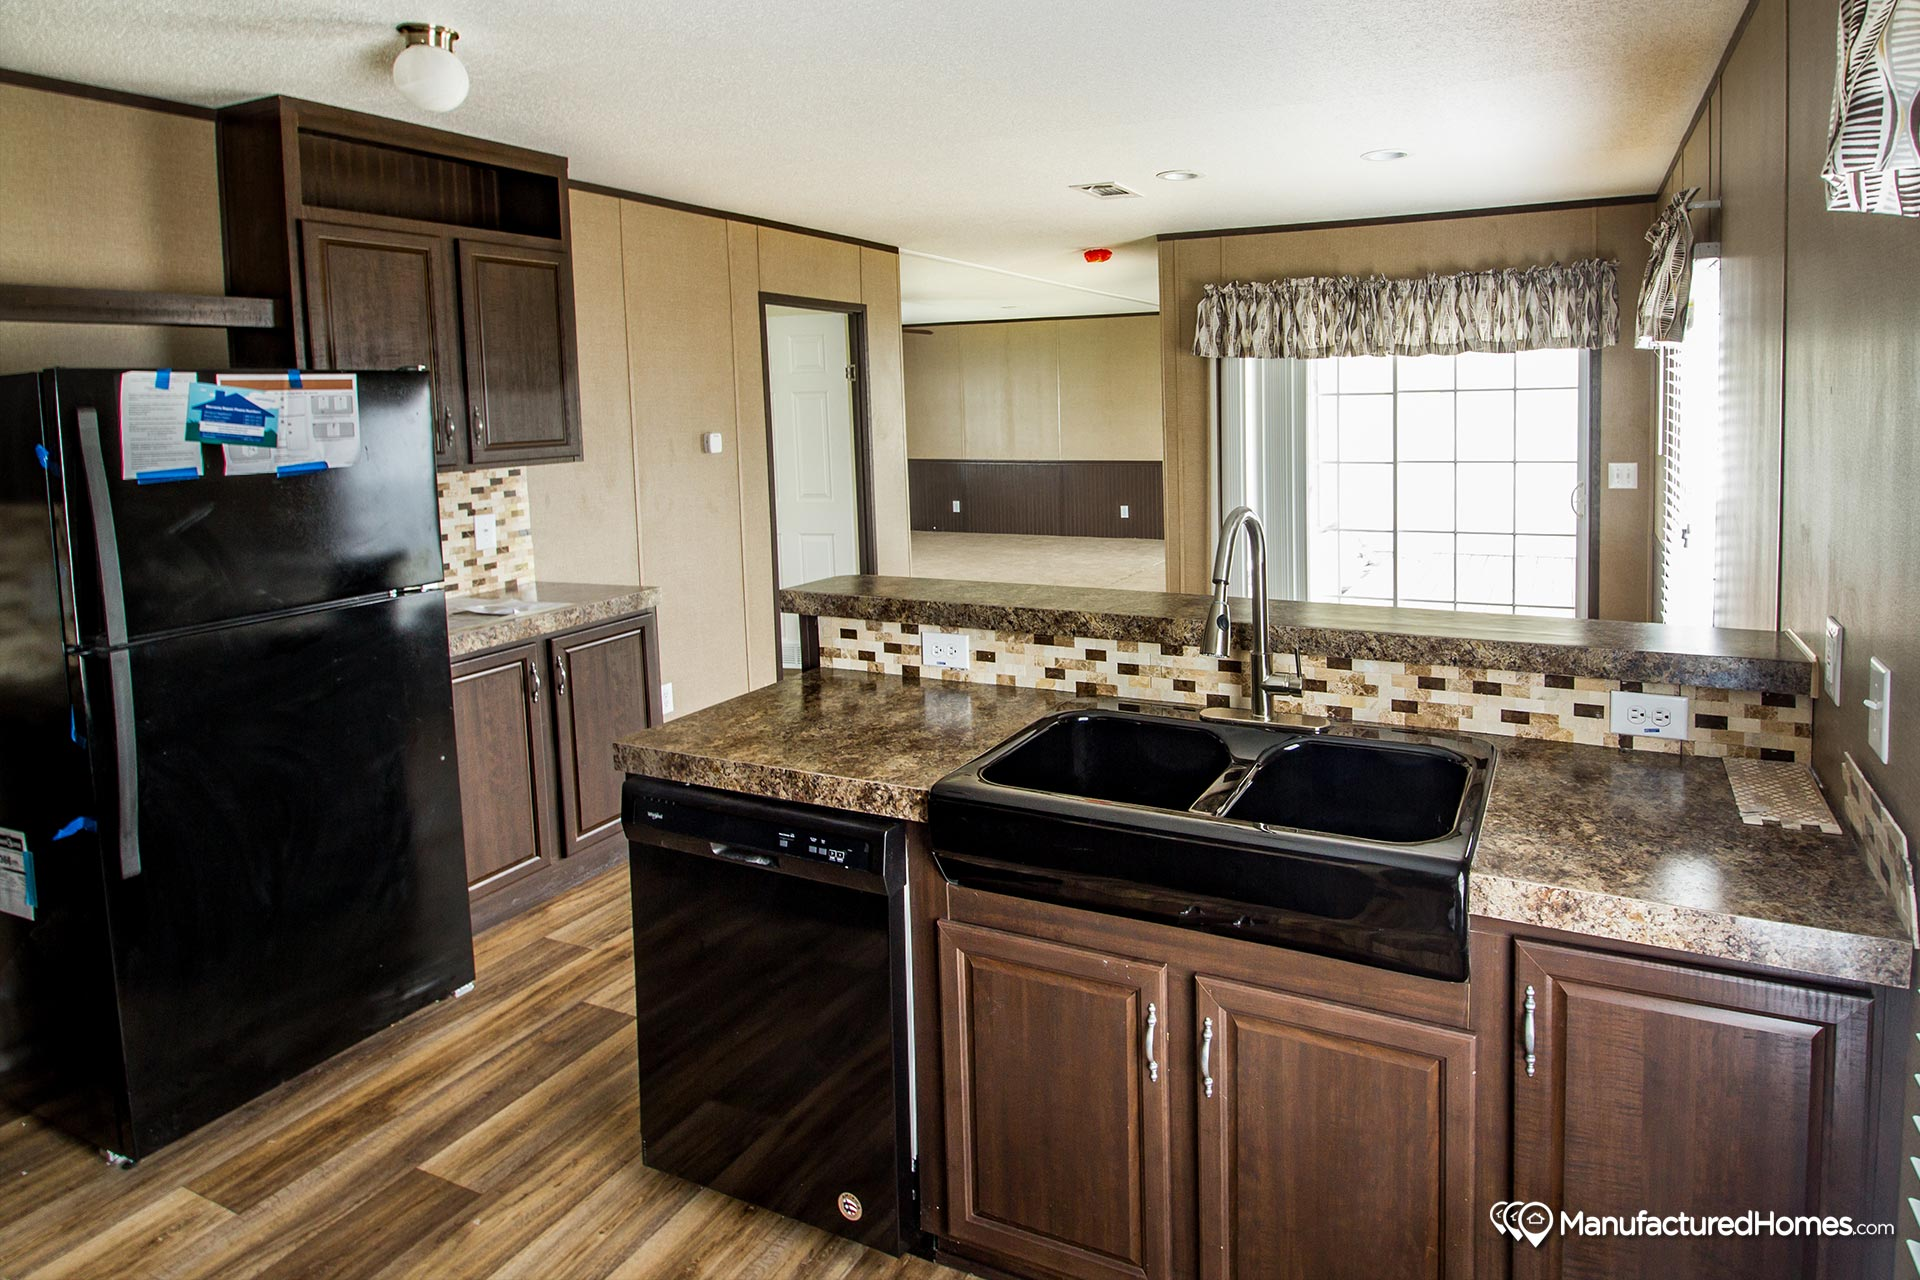 Bentli Homes in Caddo Mills, TX - Manufactured Home Dealer